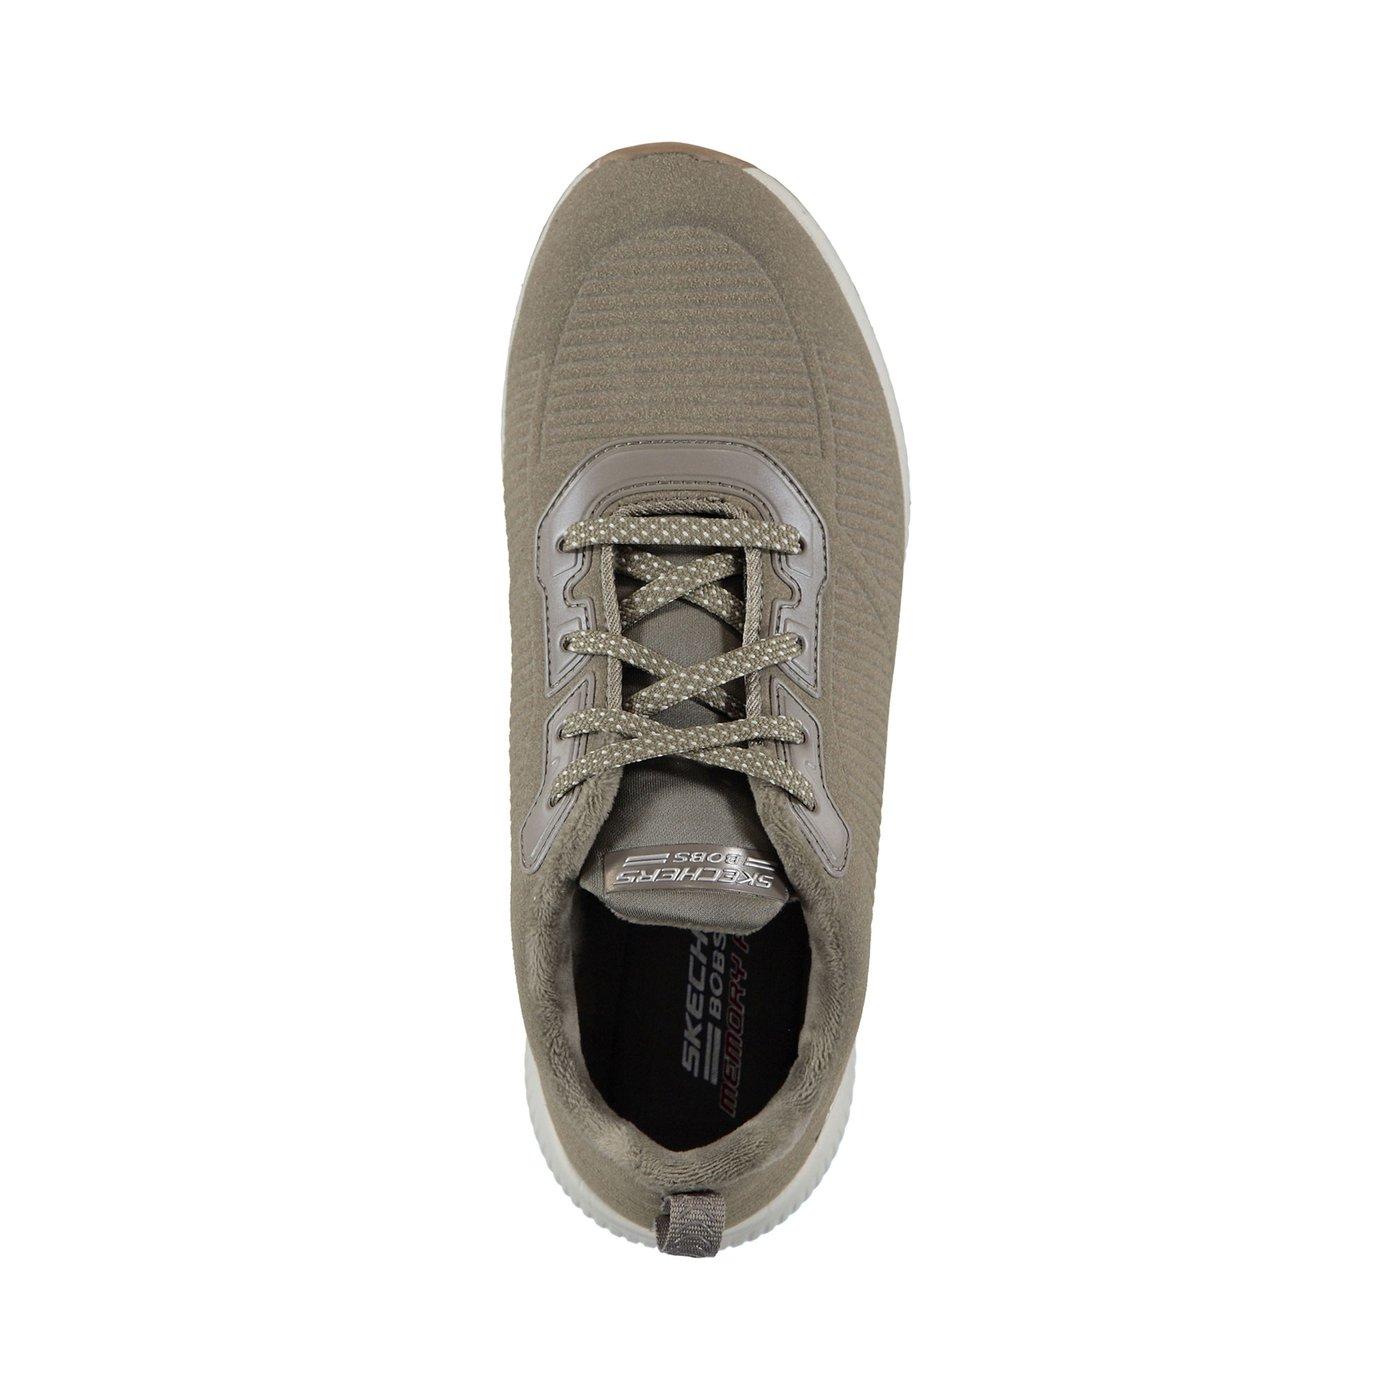 Skechers Bobs Squad - Team Bobs Kadın Kahverengi Sneaker